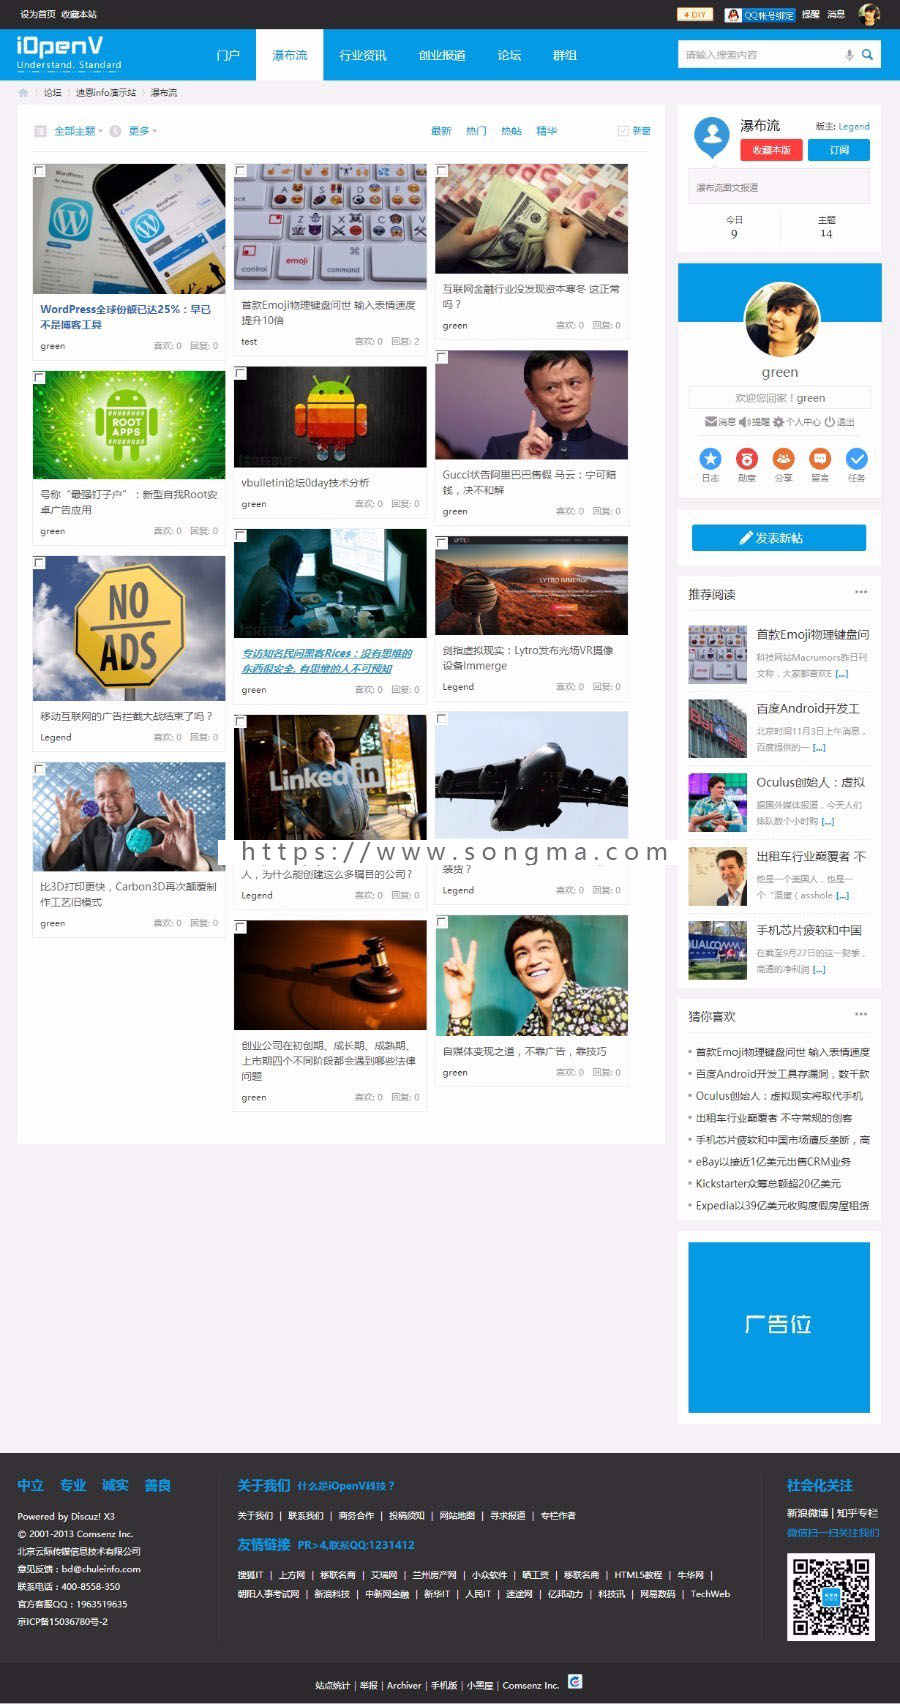 discuz 模板 资讯轻博客 商业版 dz新闻科技资讯门户模板